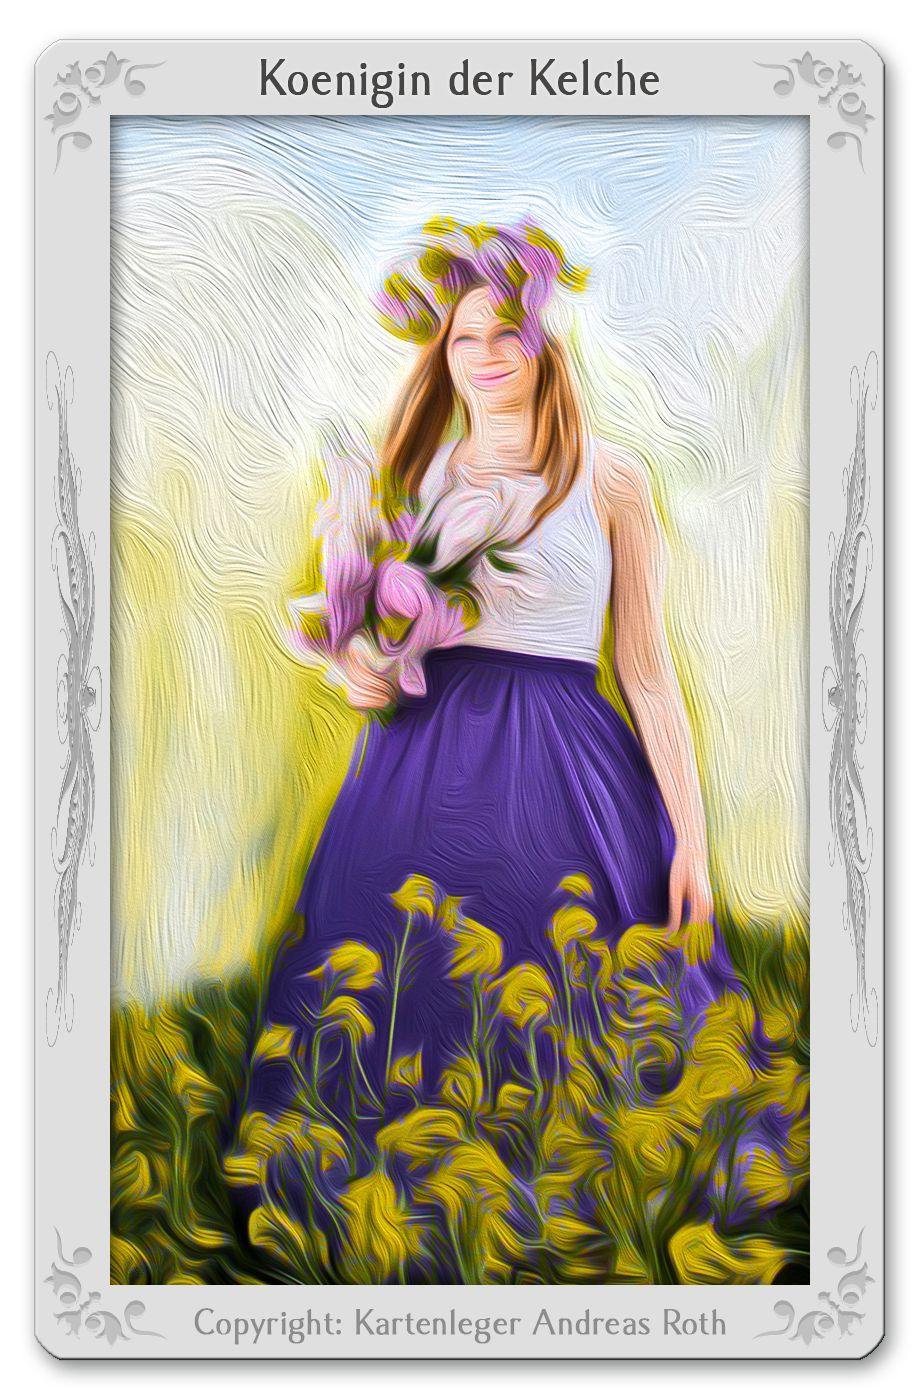 Tarotkarte Königin der Kelche: Bedeutung, Kombinationen, Deutung